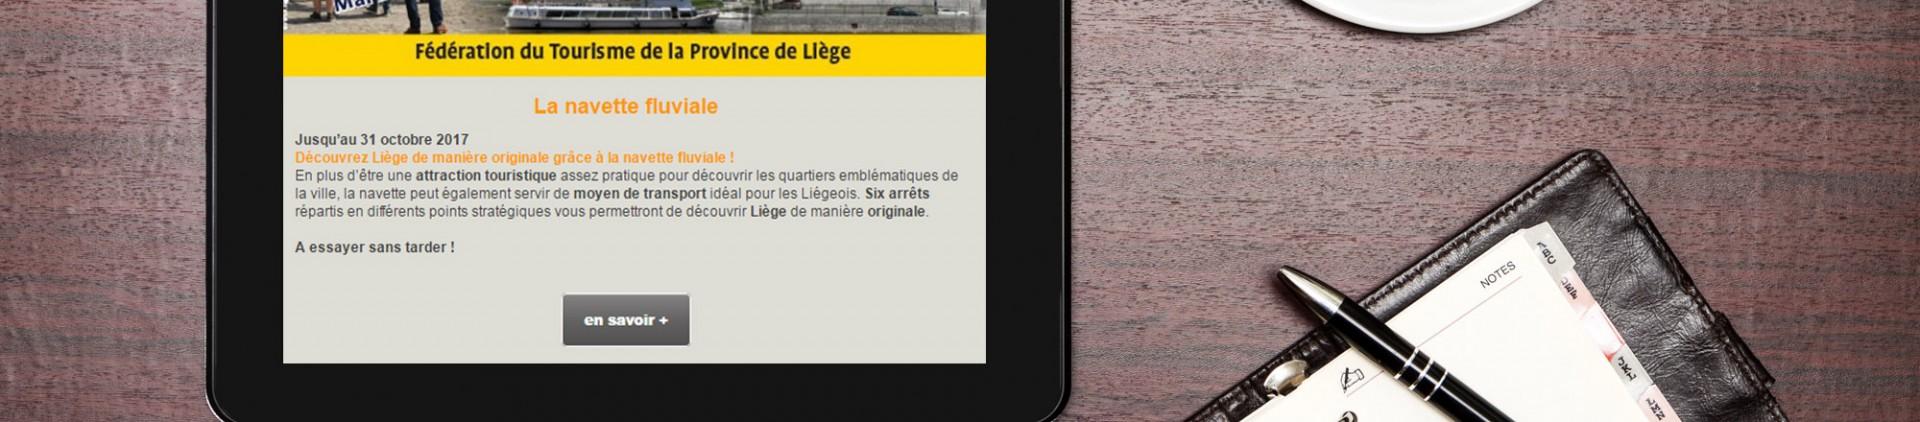 Newsletter mensuelle FTPL - province de Liège